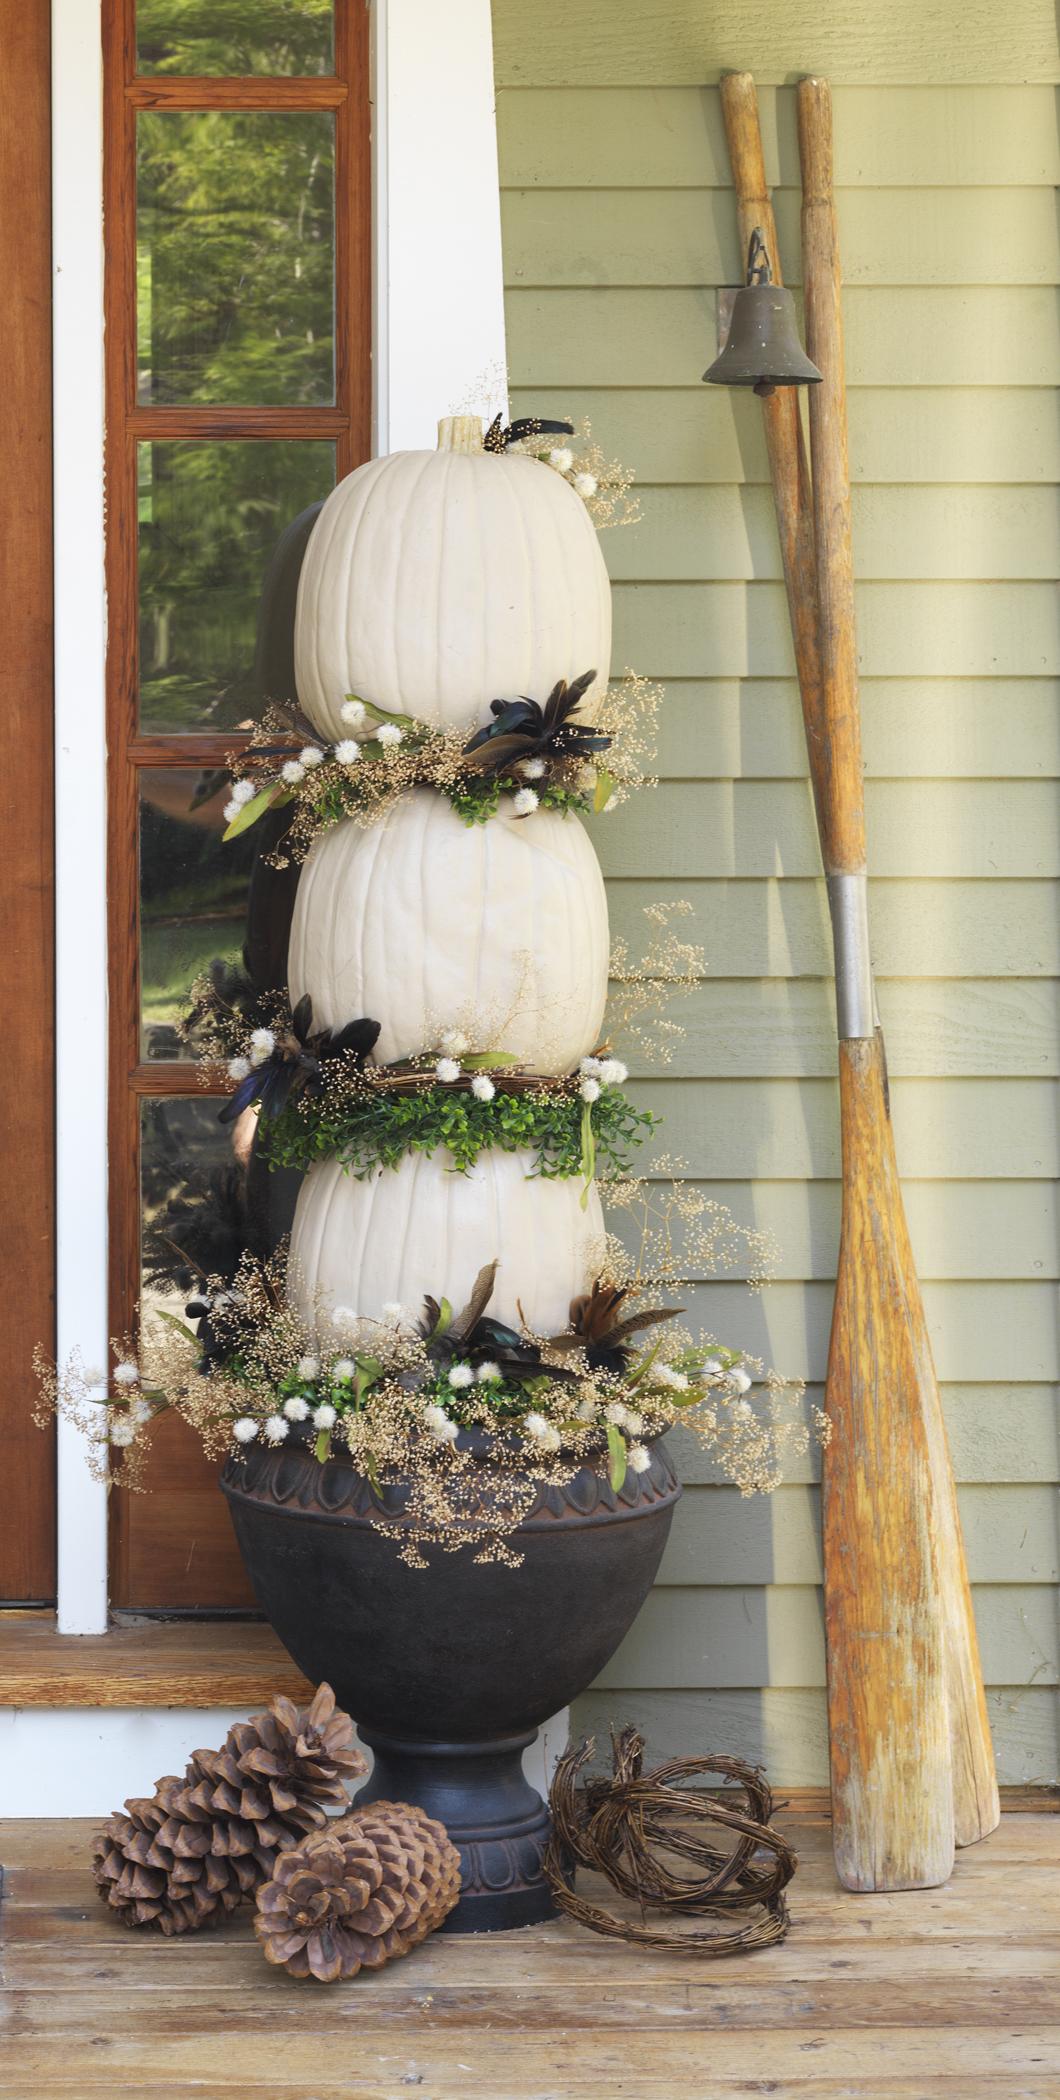 Halloween Joanne Palmisano Interior Designer